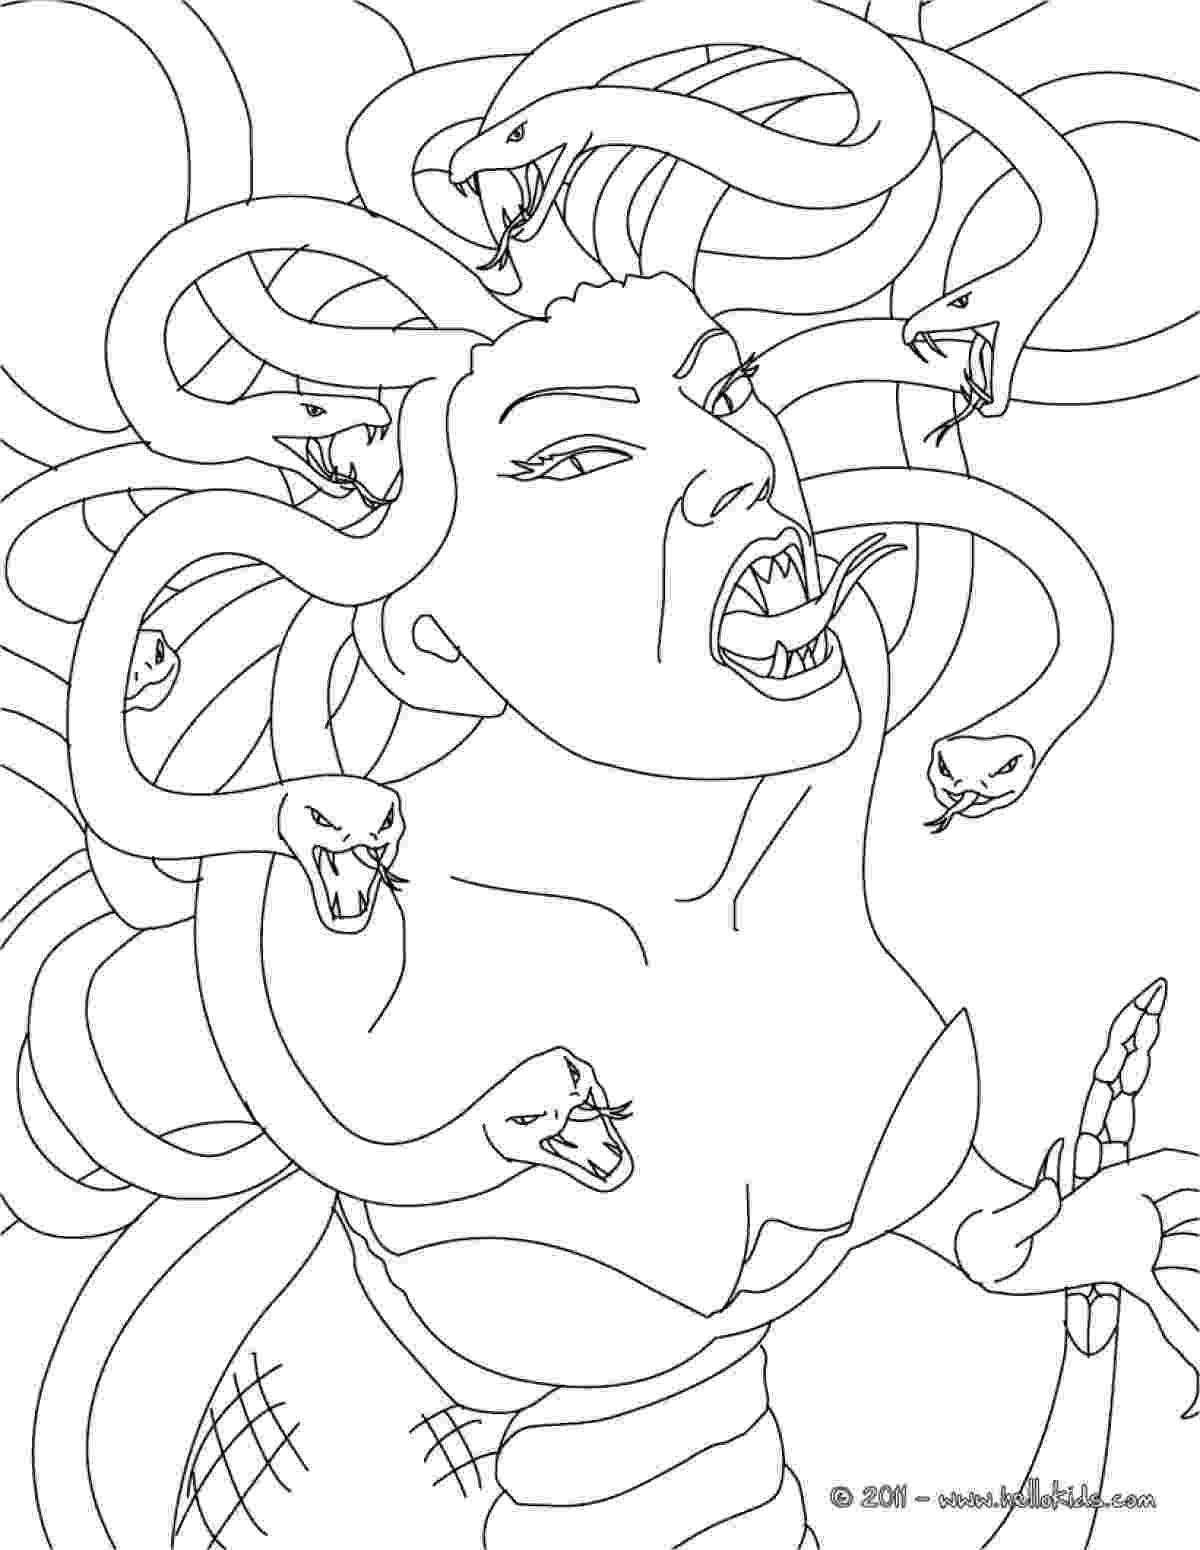 greek mythology coloring pages greek mythology drawing at getdrawings free download pages greek mythology coloring